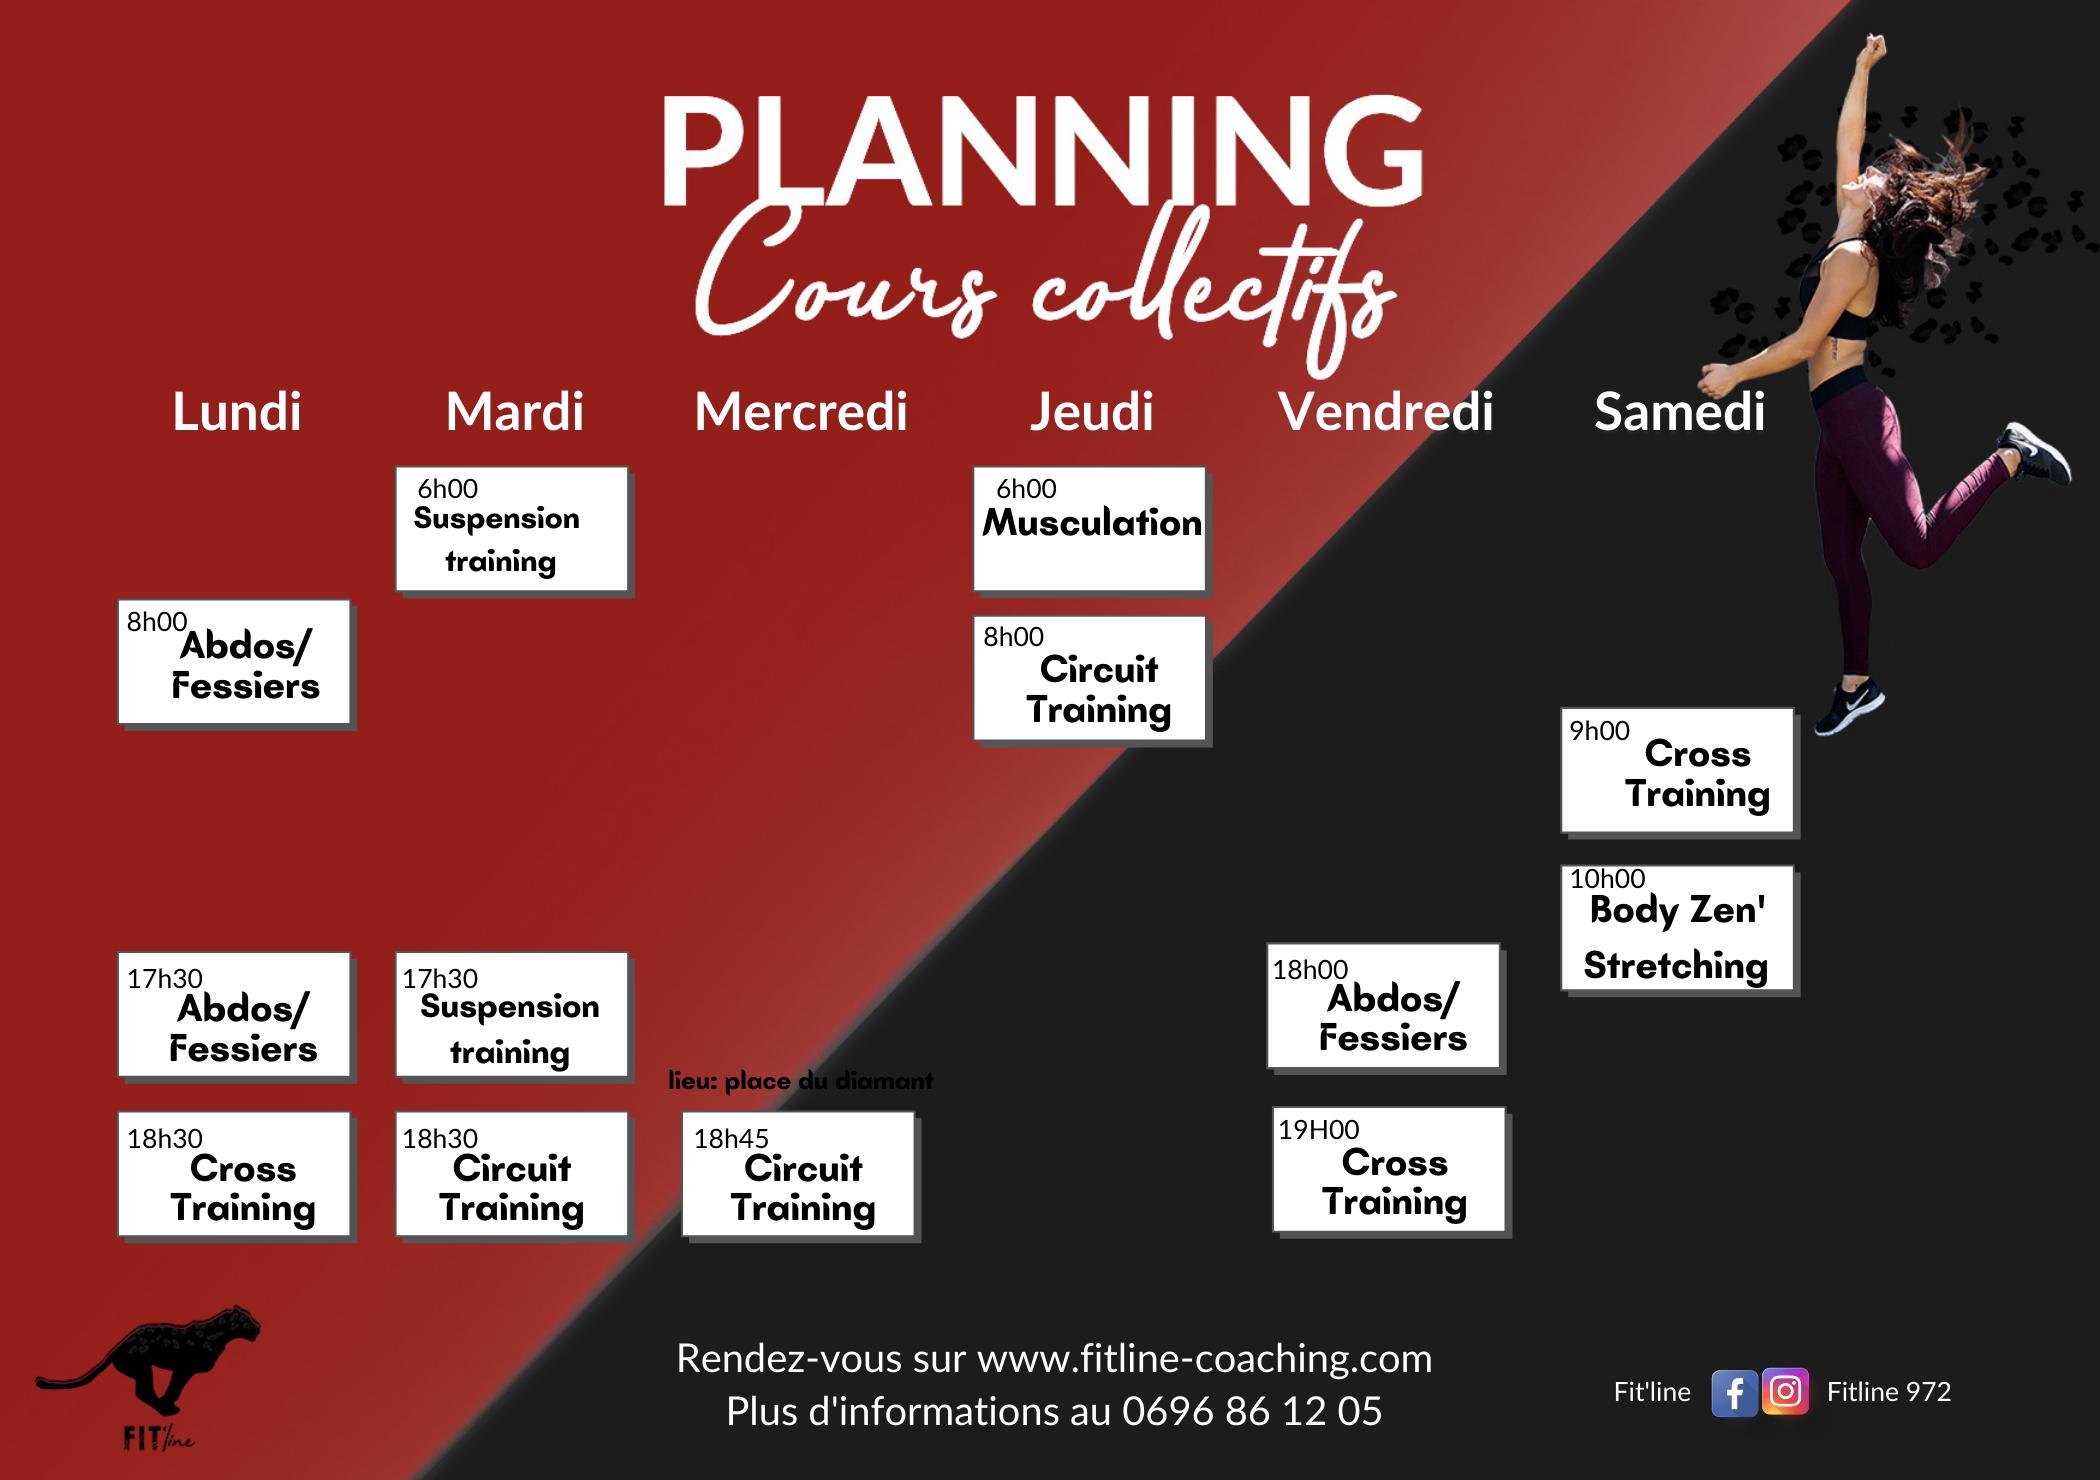 Planning des cours collectifs